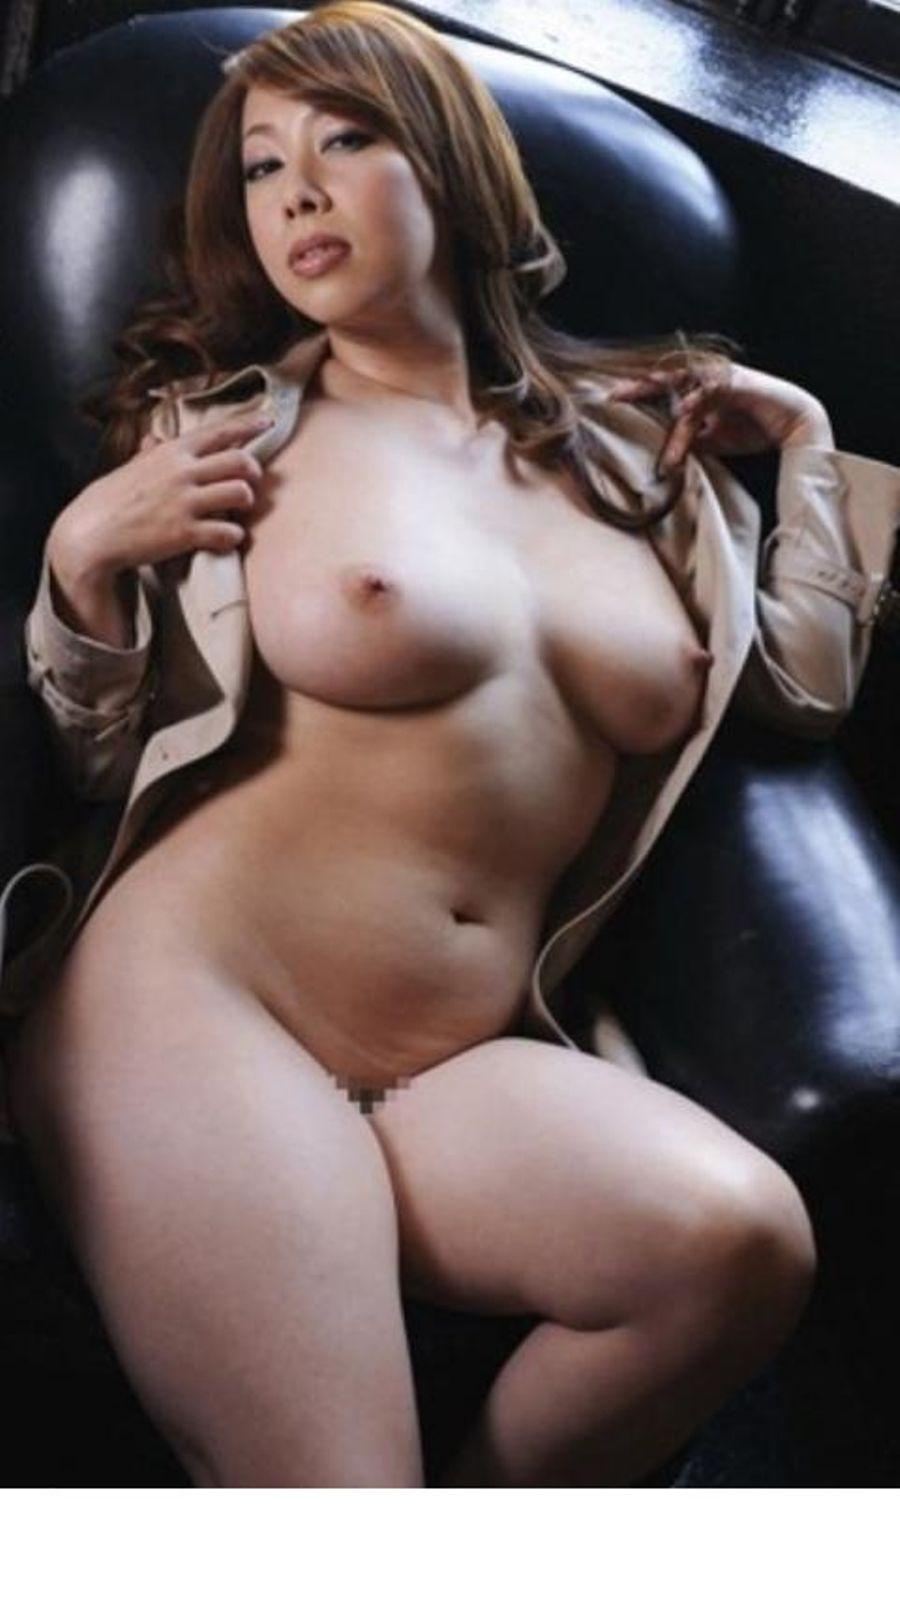 yumi kazama porn video